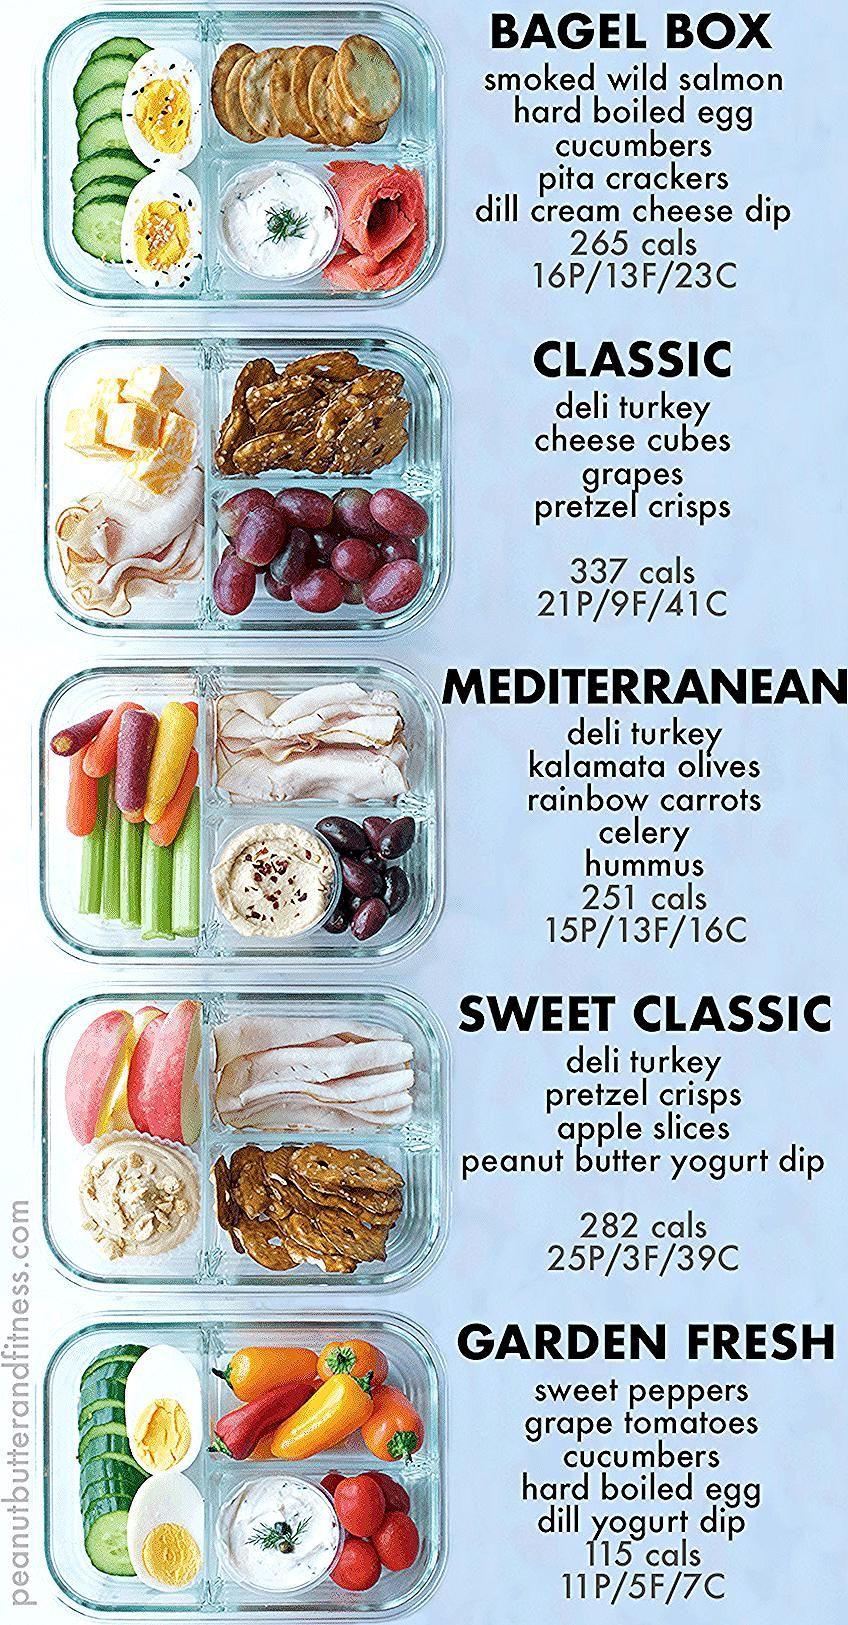 Bento Box Snack Prep Ideas - Peanut Butter and Fitness  #bento #butter #fitness #fitnessfood #ideas...